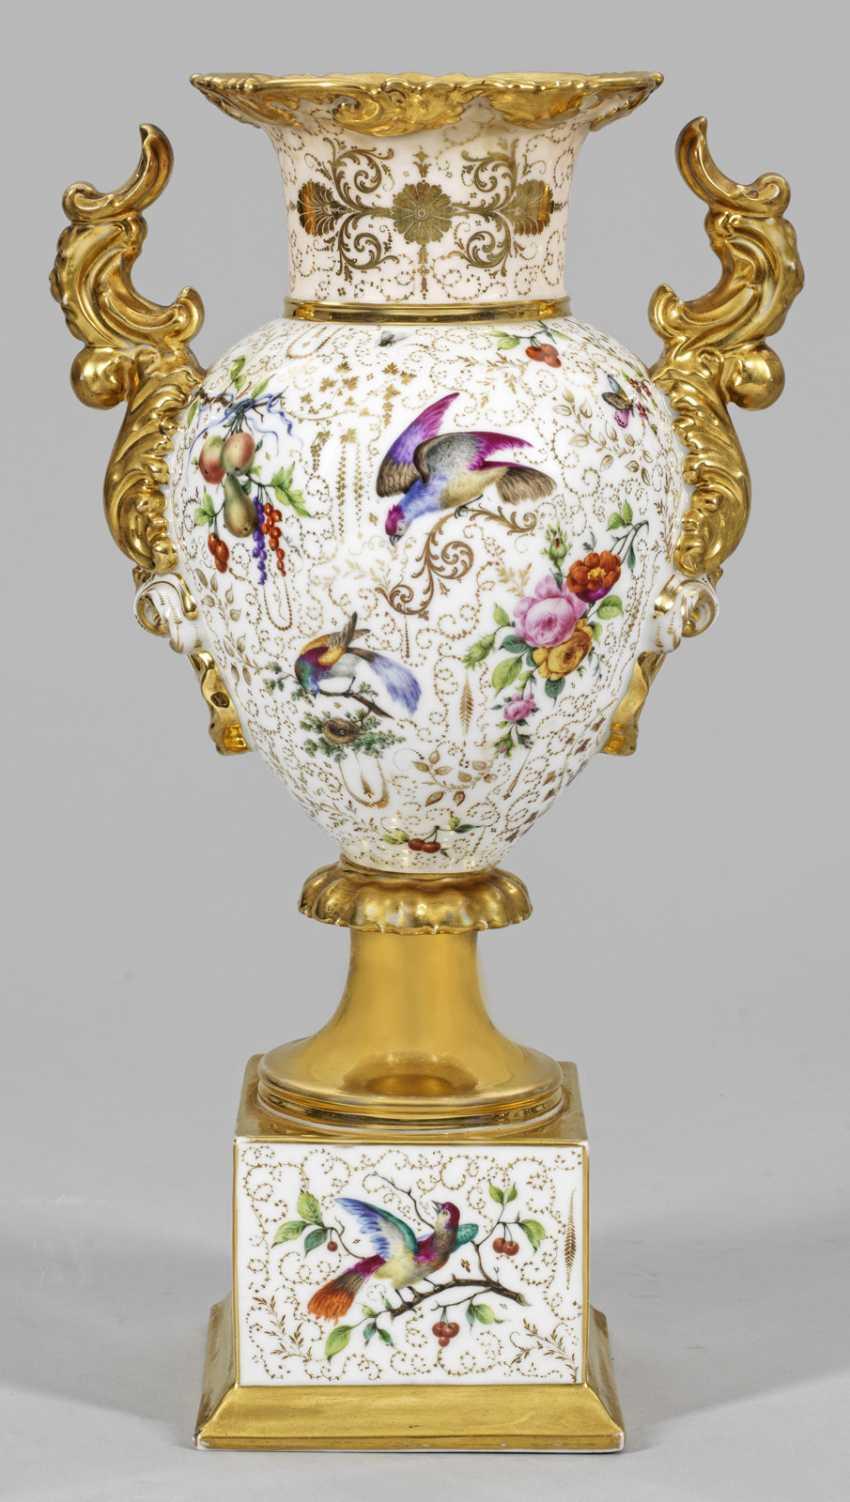 Ornate handle vase with fruit and birds of Paradise - photo 1